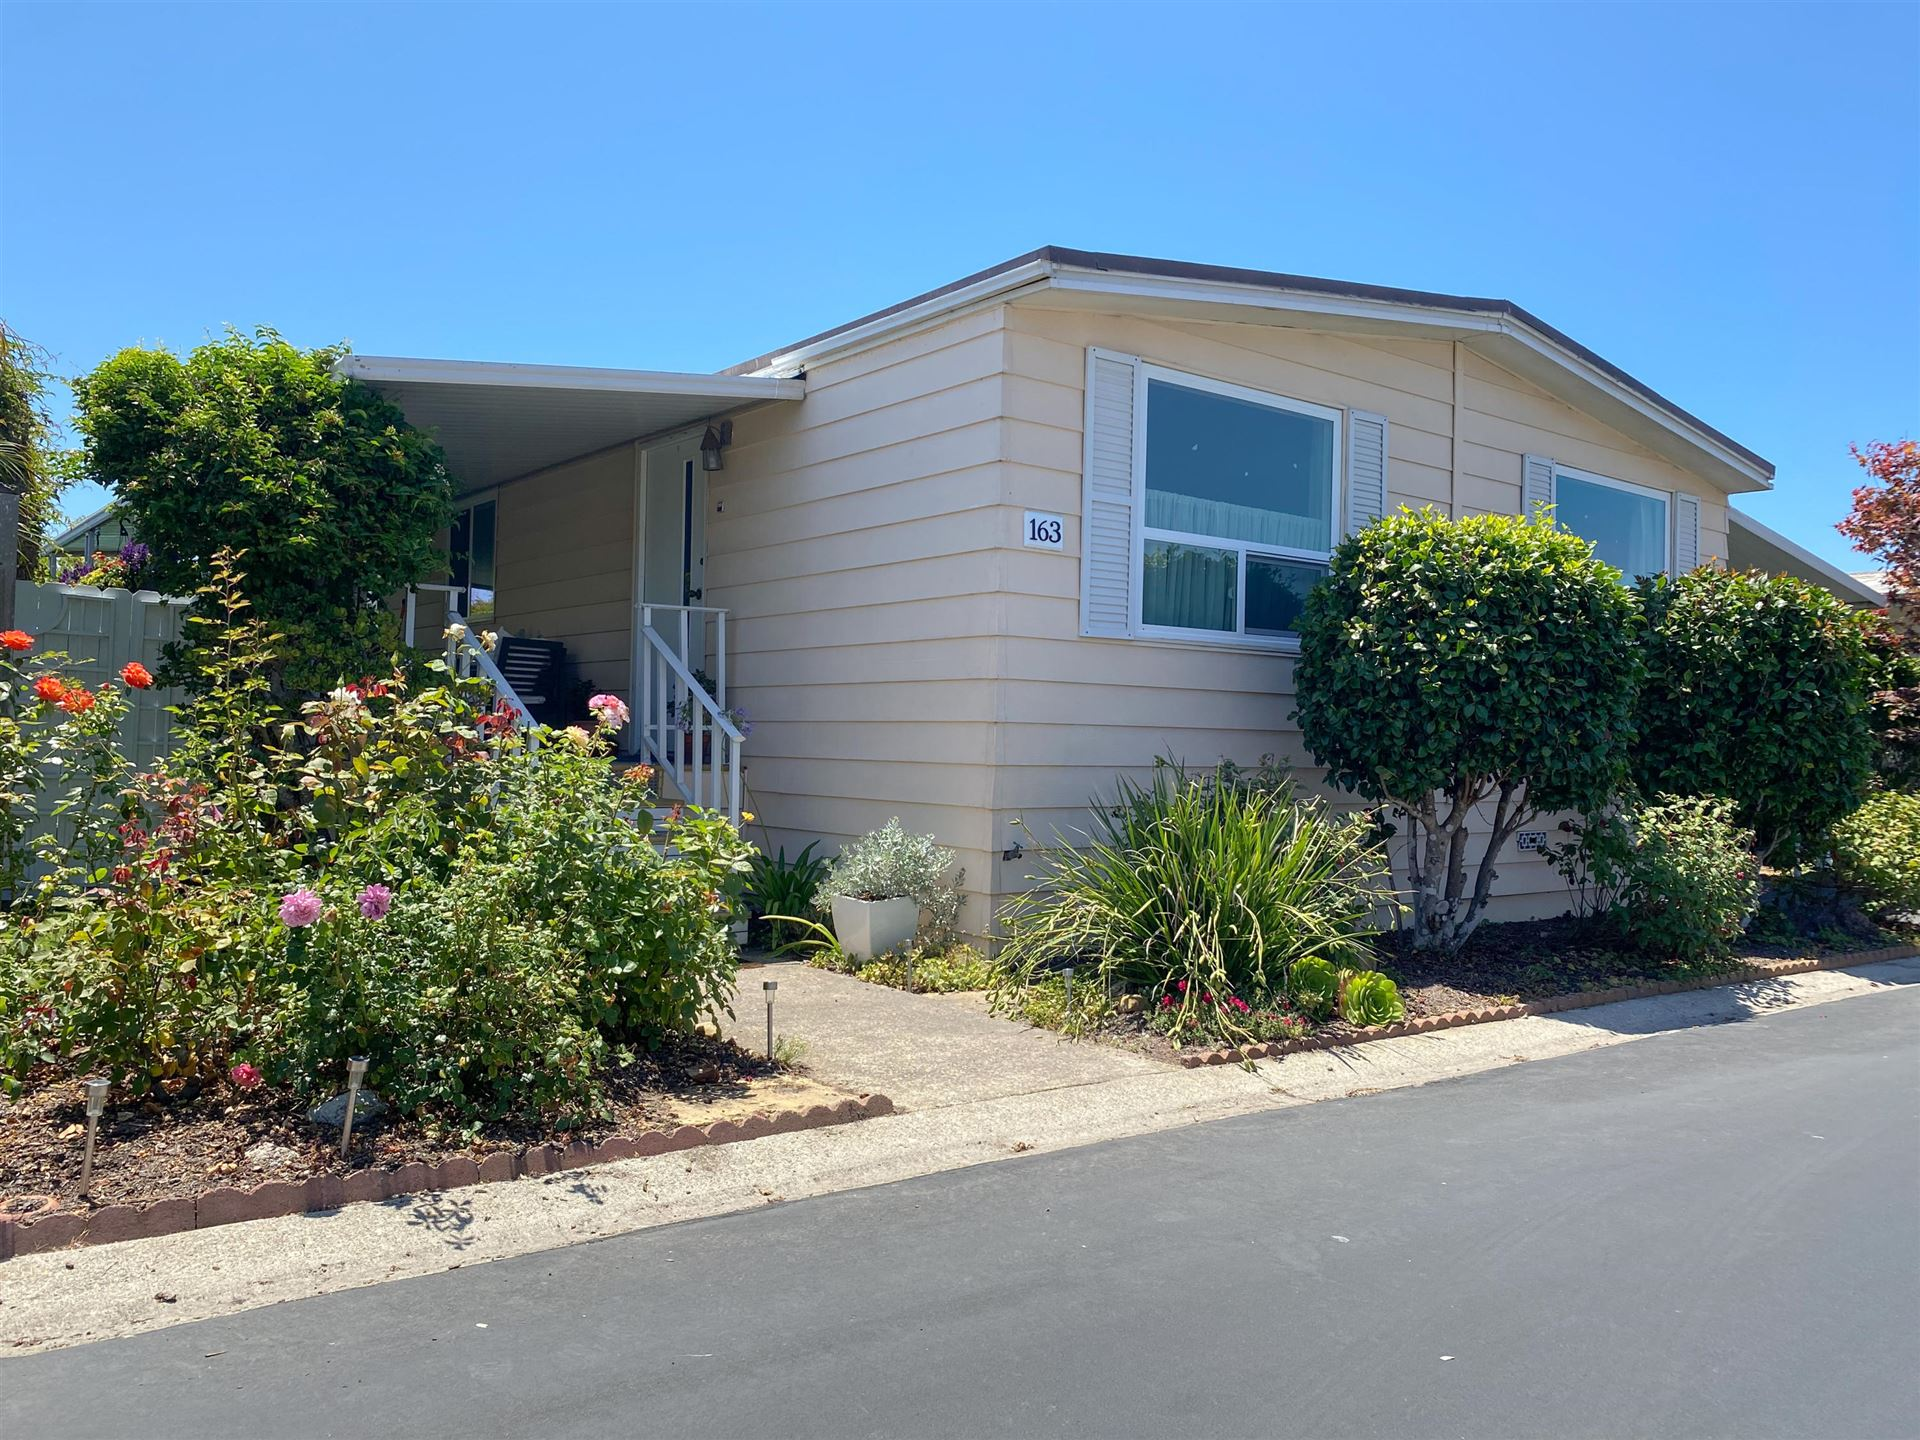 3950 Via Real #163, Santa Barbara, CA 93013 - MLS#: 21-3147